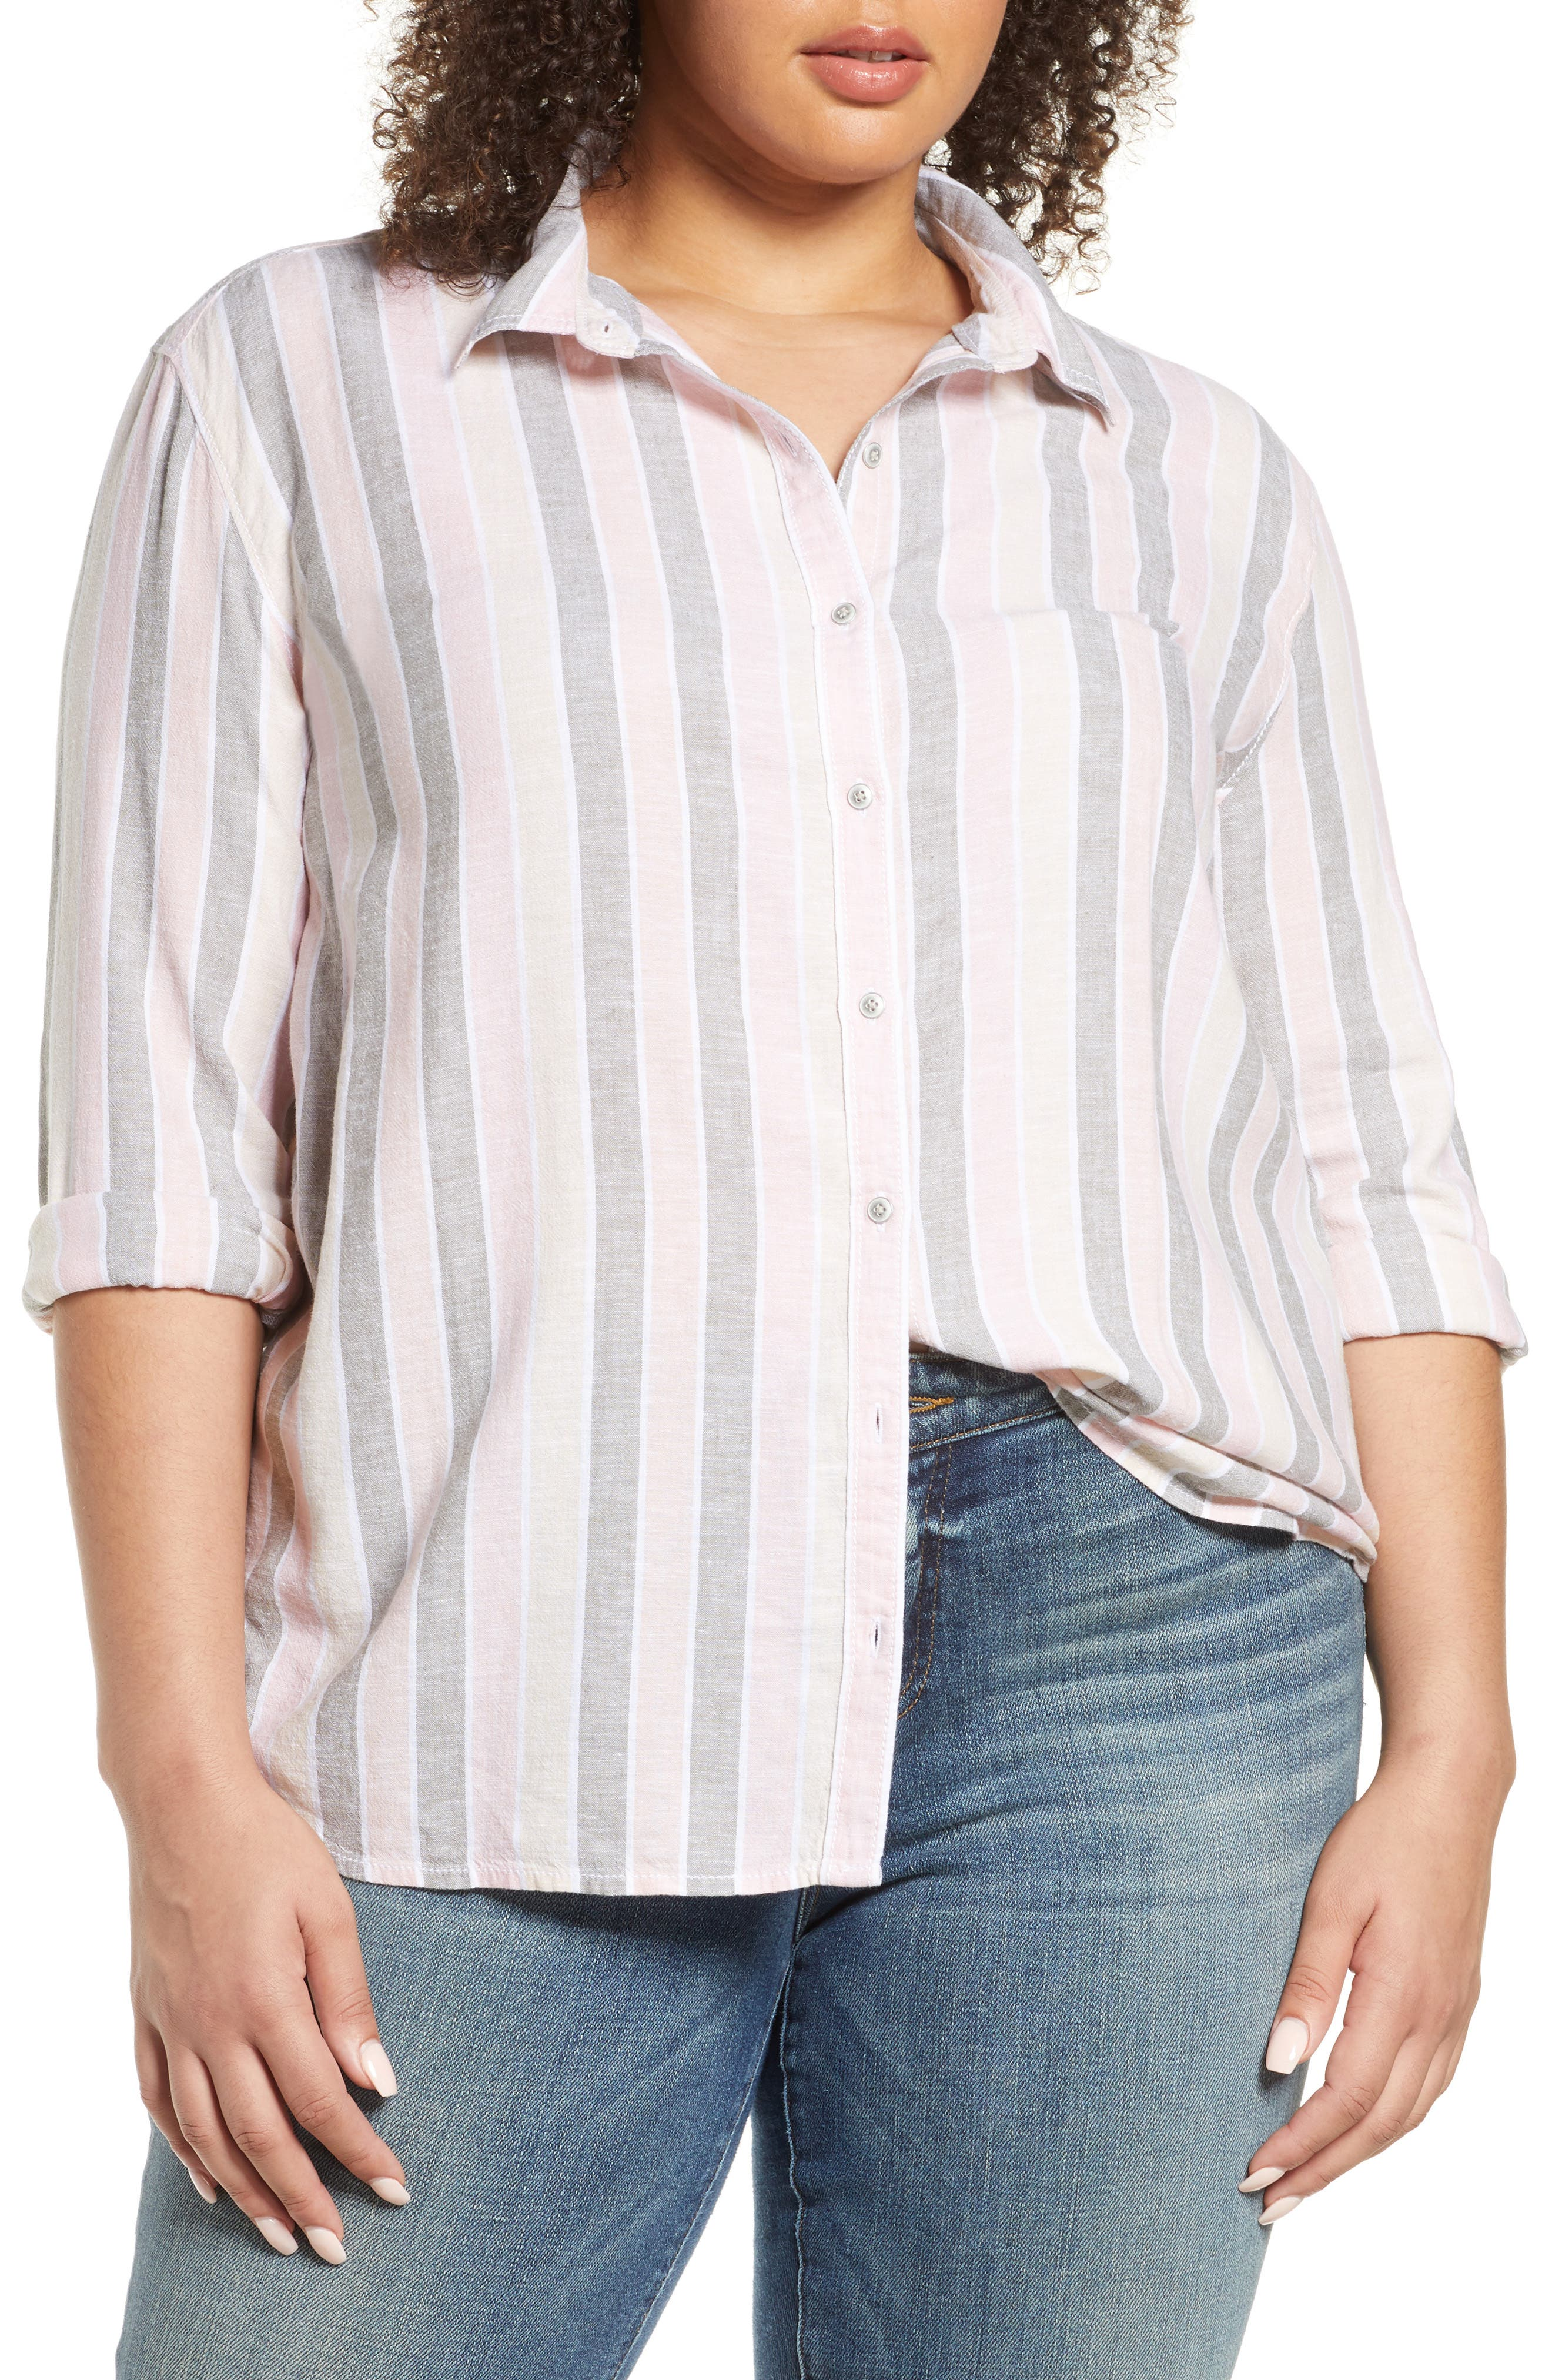 Image of Caslon Cabana Stripe Linen Blend Button Front Top